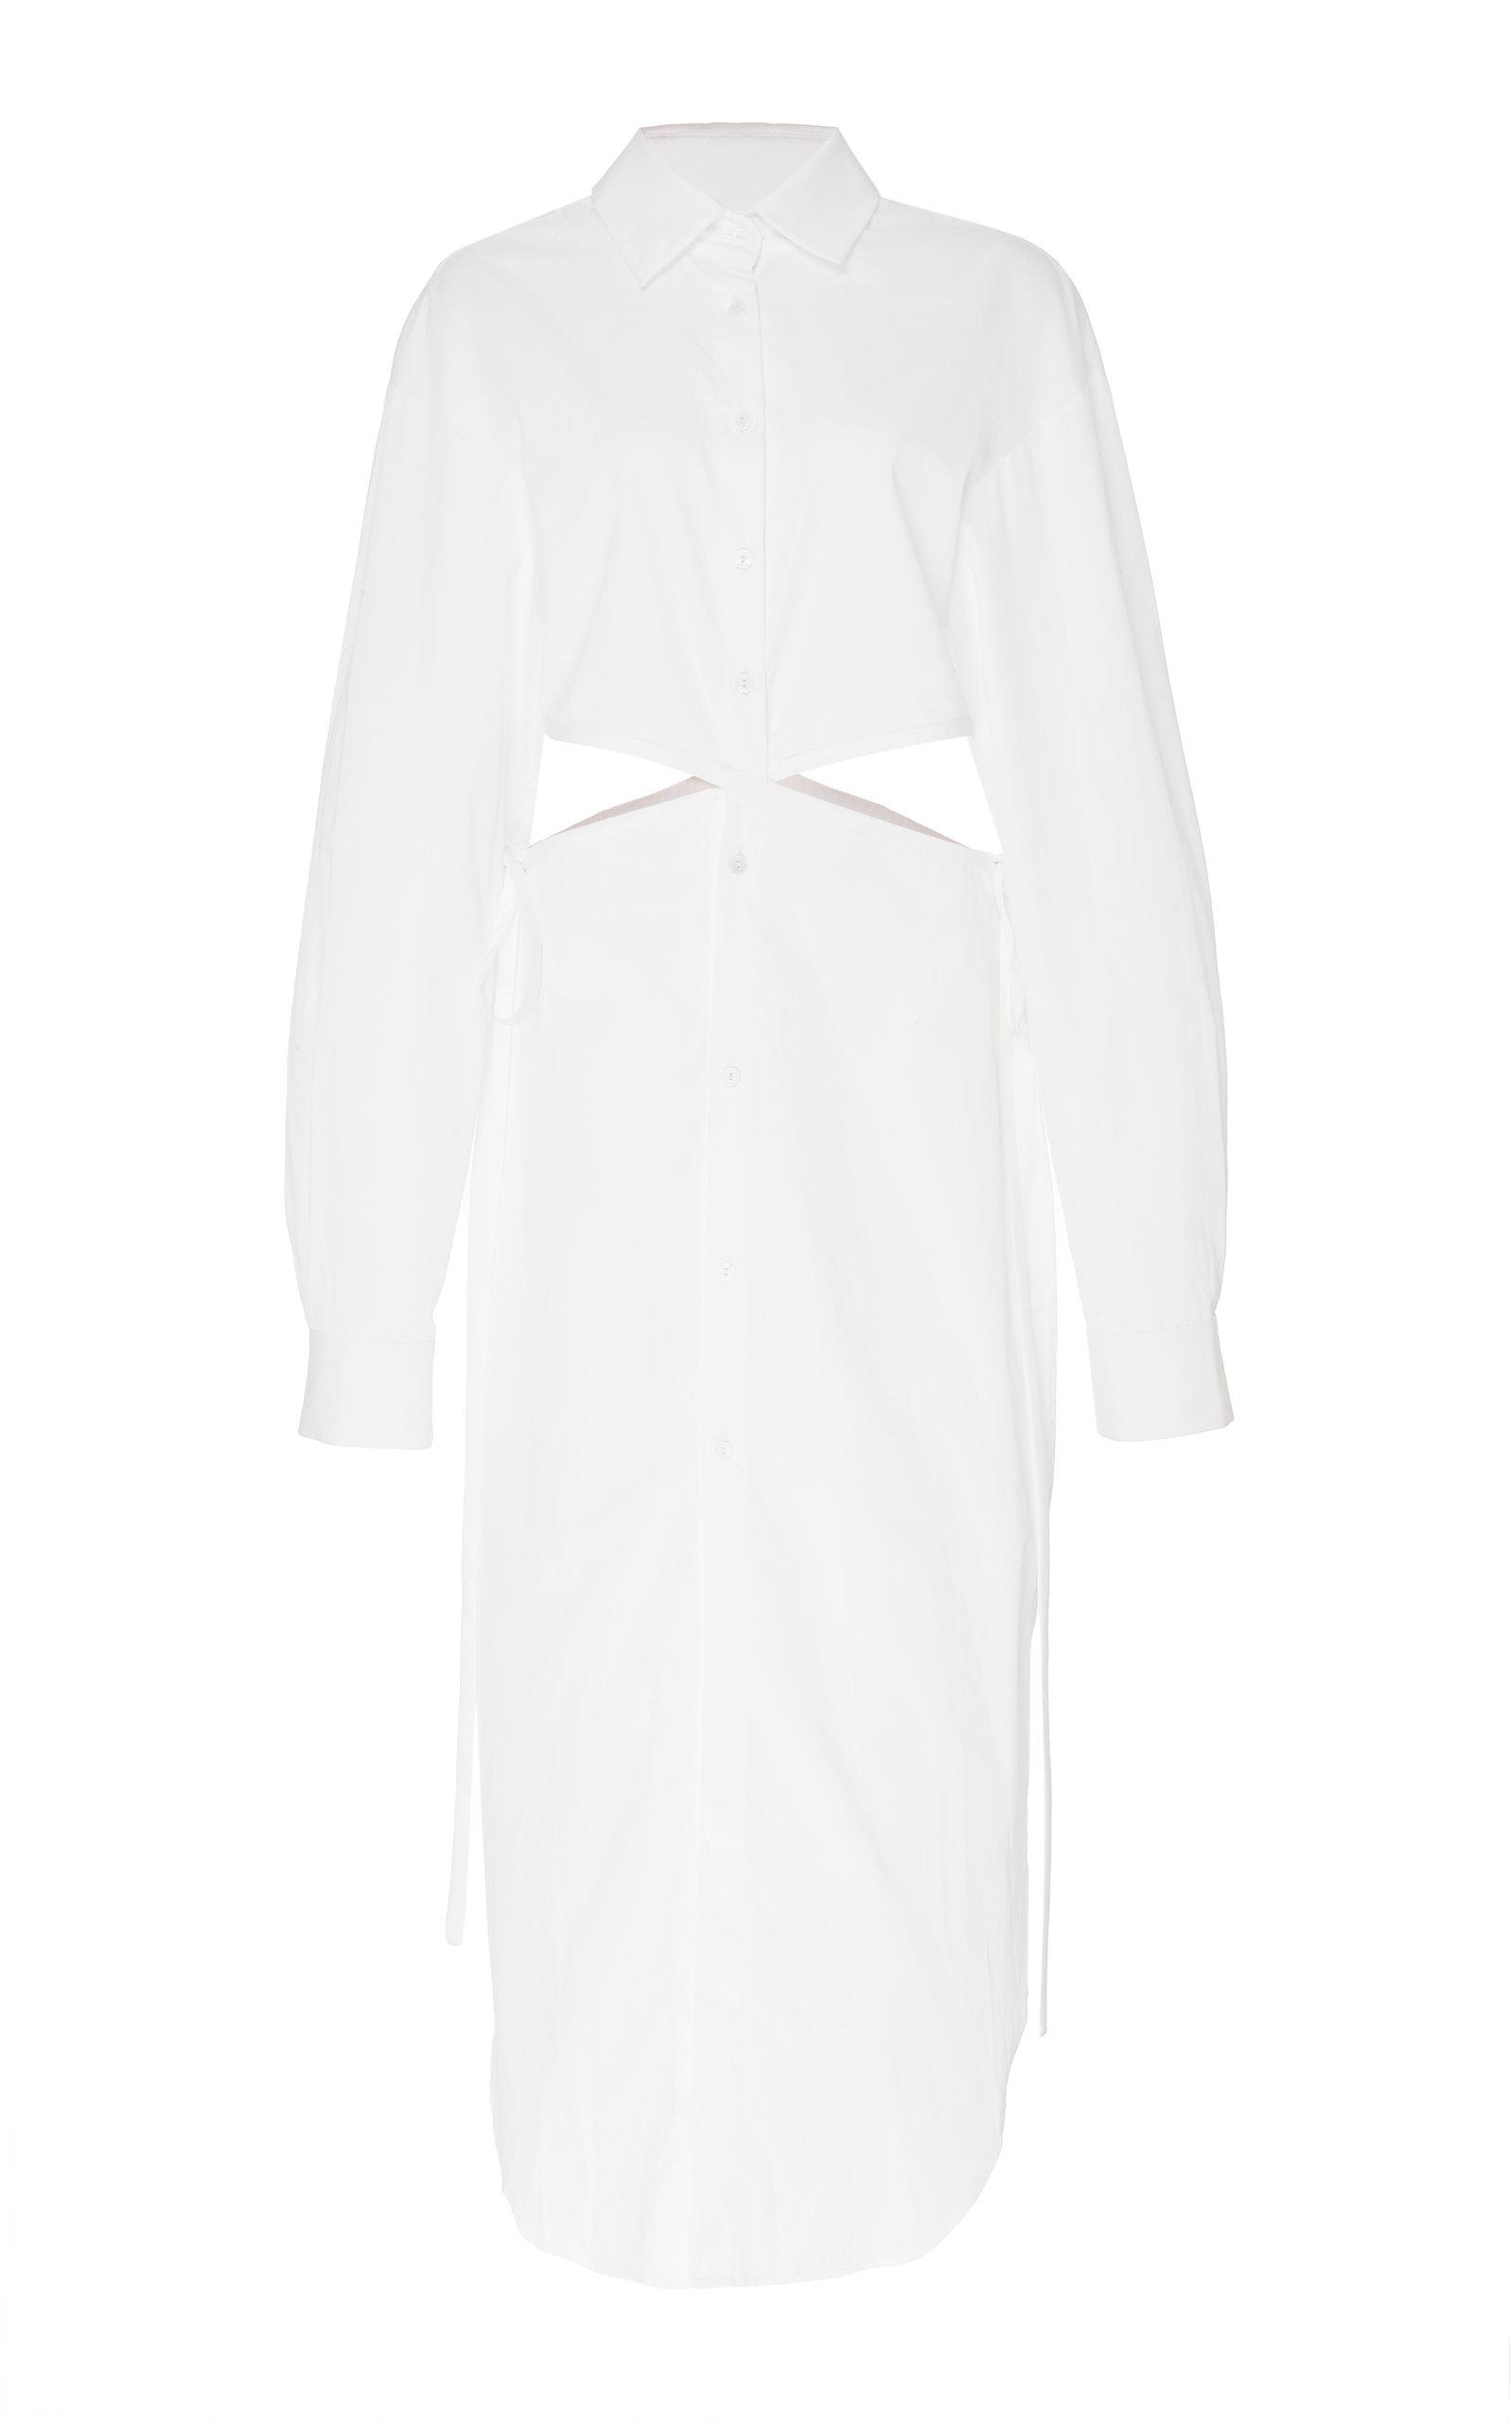 Buy Christopher Esber Twisted Cutout Cotton-Poplin Shirt Dress online, shop Christopher Esber at the best price